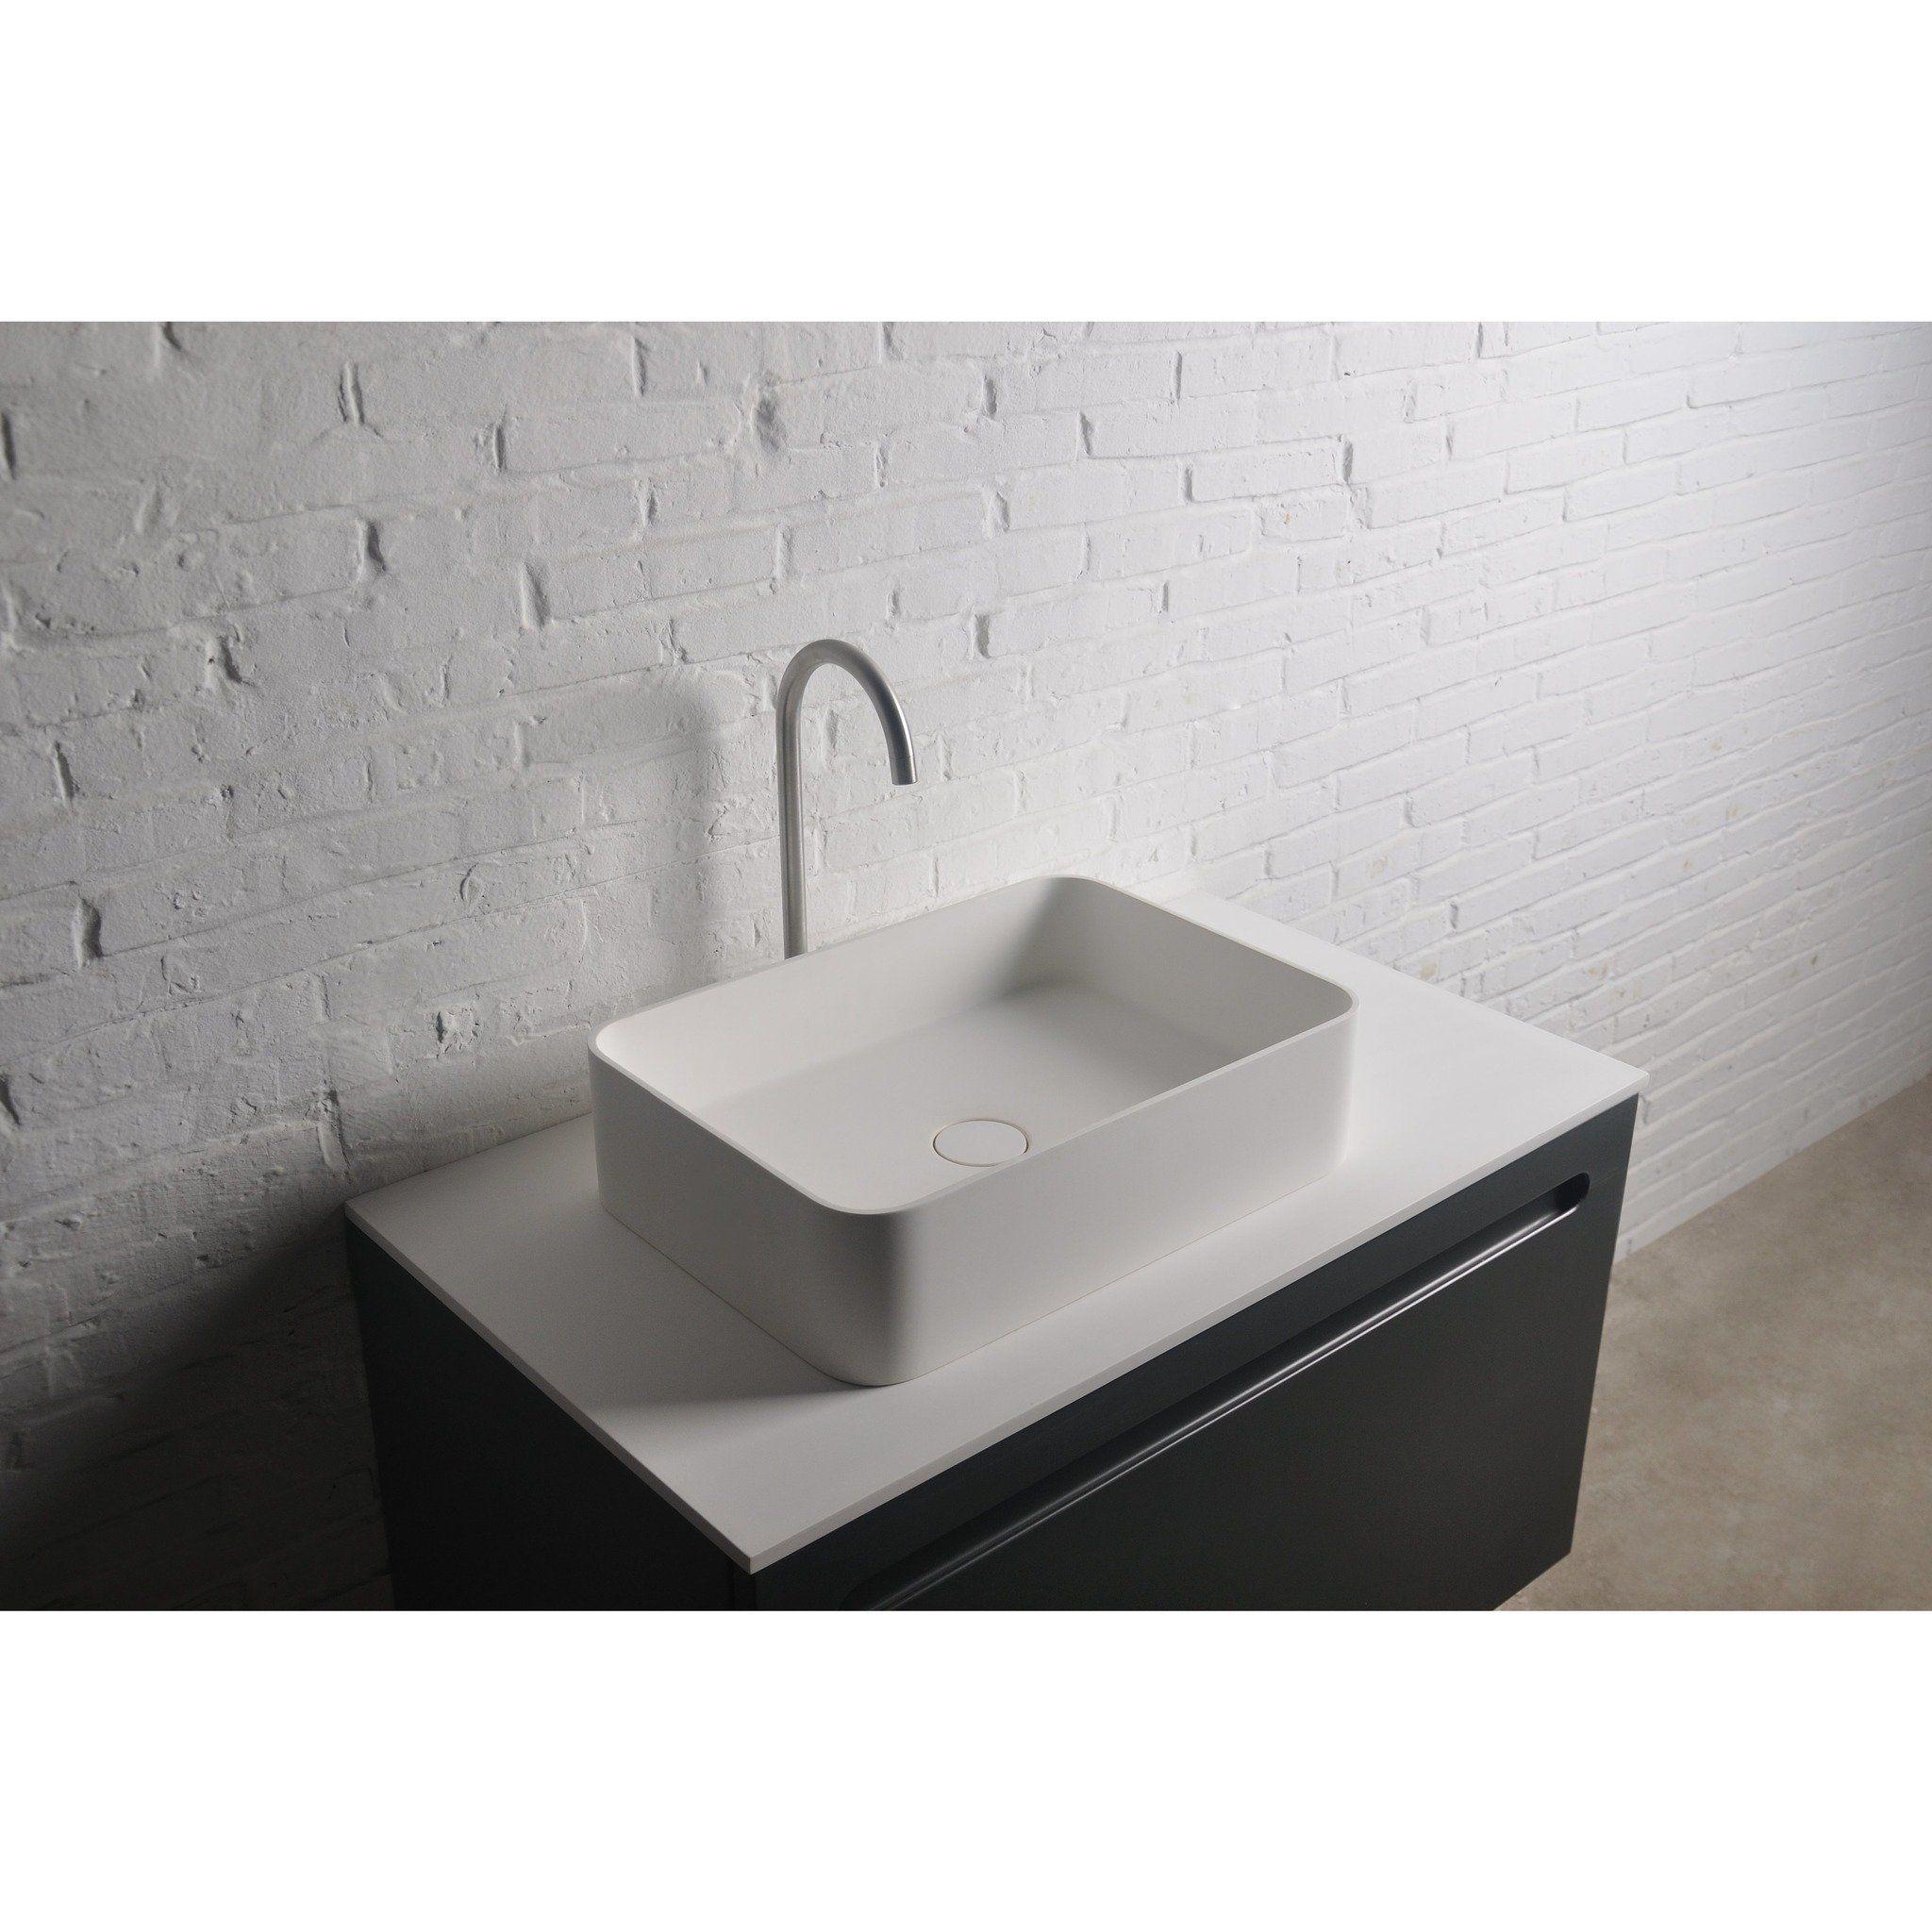 Ideavit Thin Rectangular Solid Surface Vessel Sink Bowl